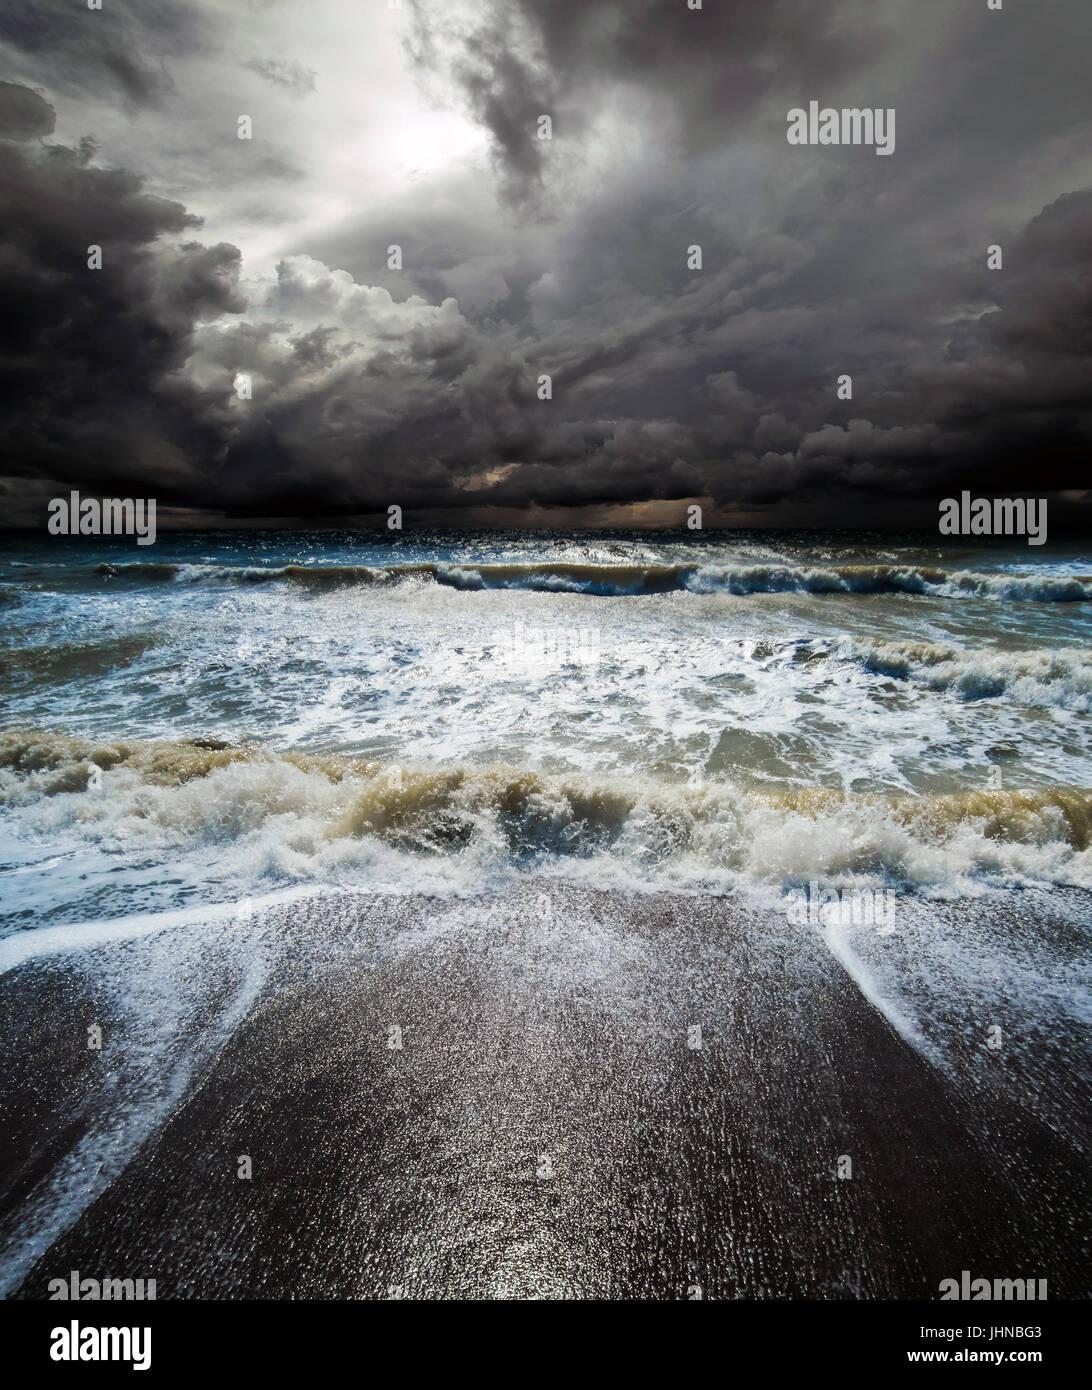 Ocean storm image background - Stock Image